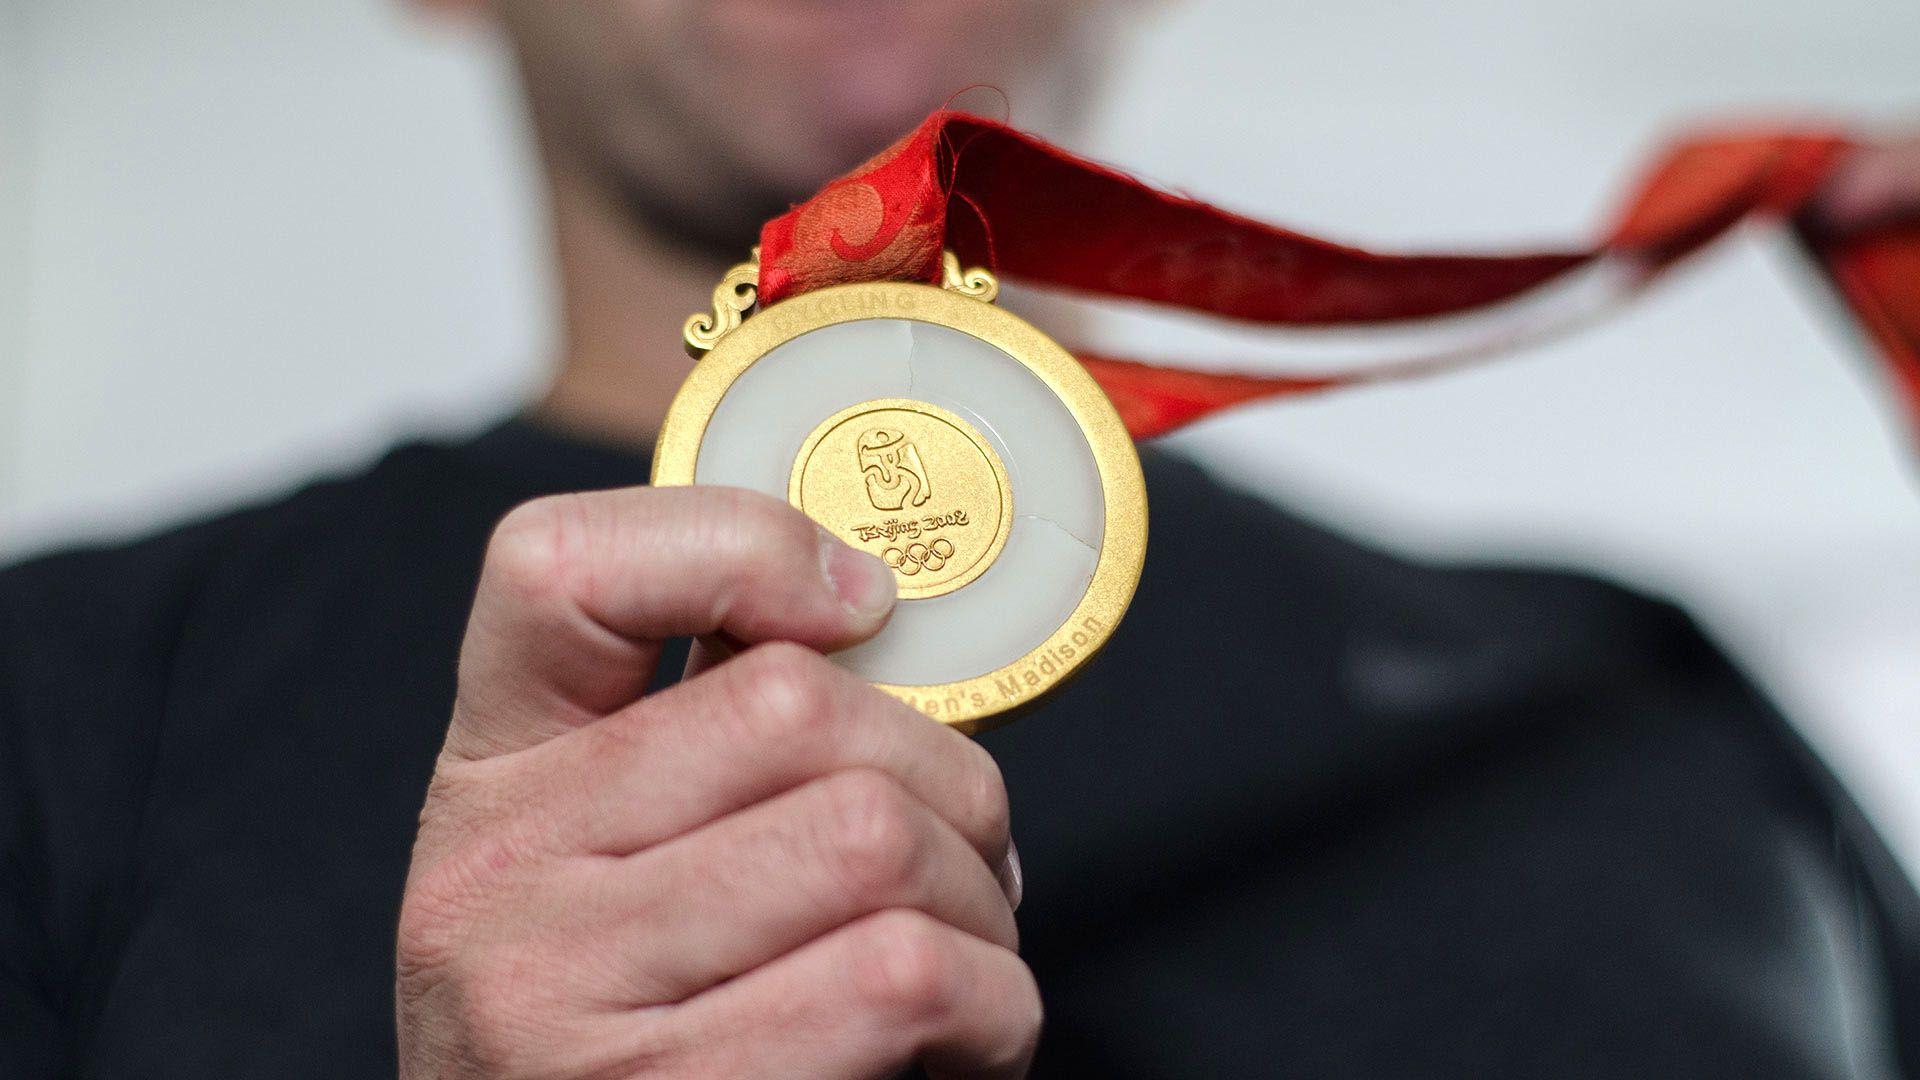 walter perez nota olimpicos